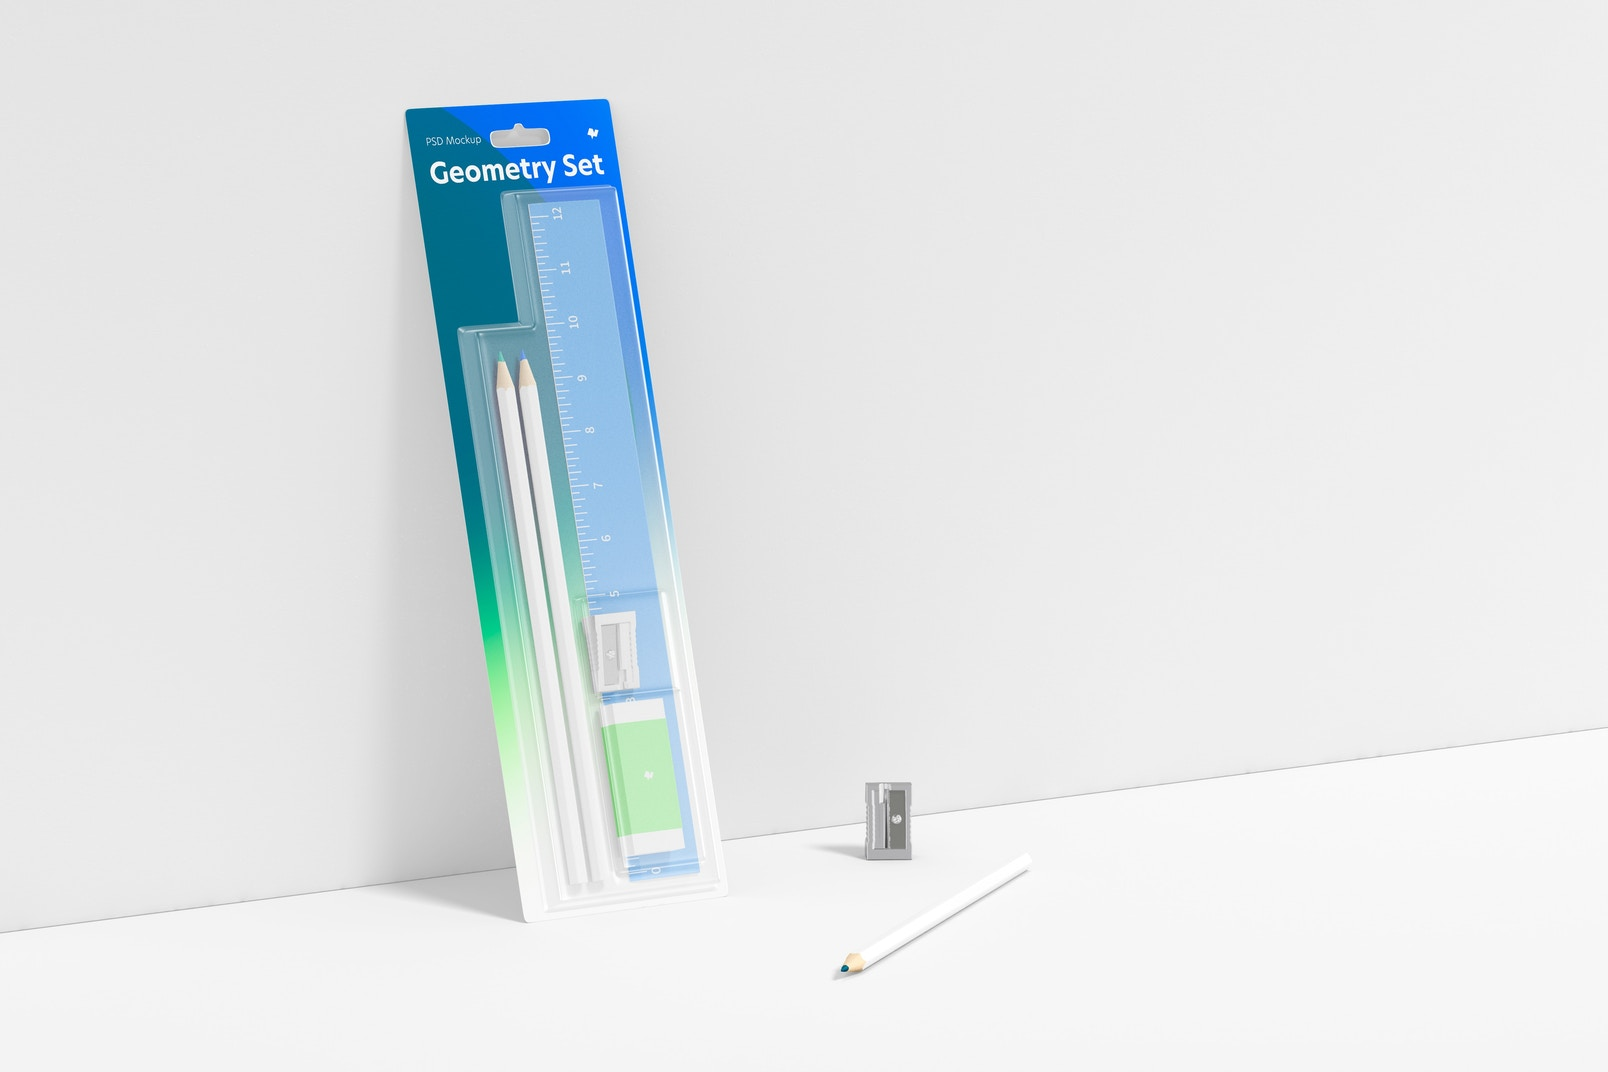 Geometry Ruler and Pencil Set Mockup, Leaned